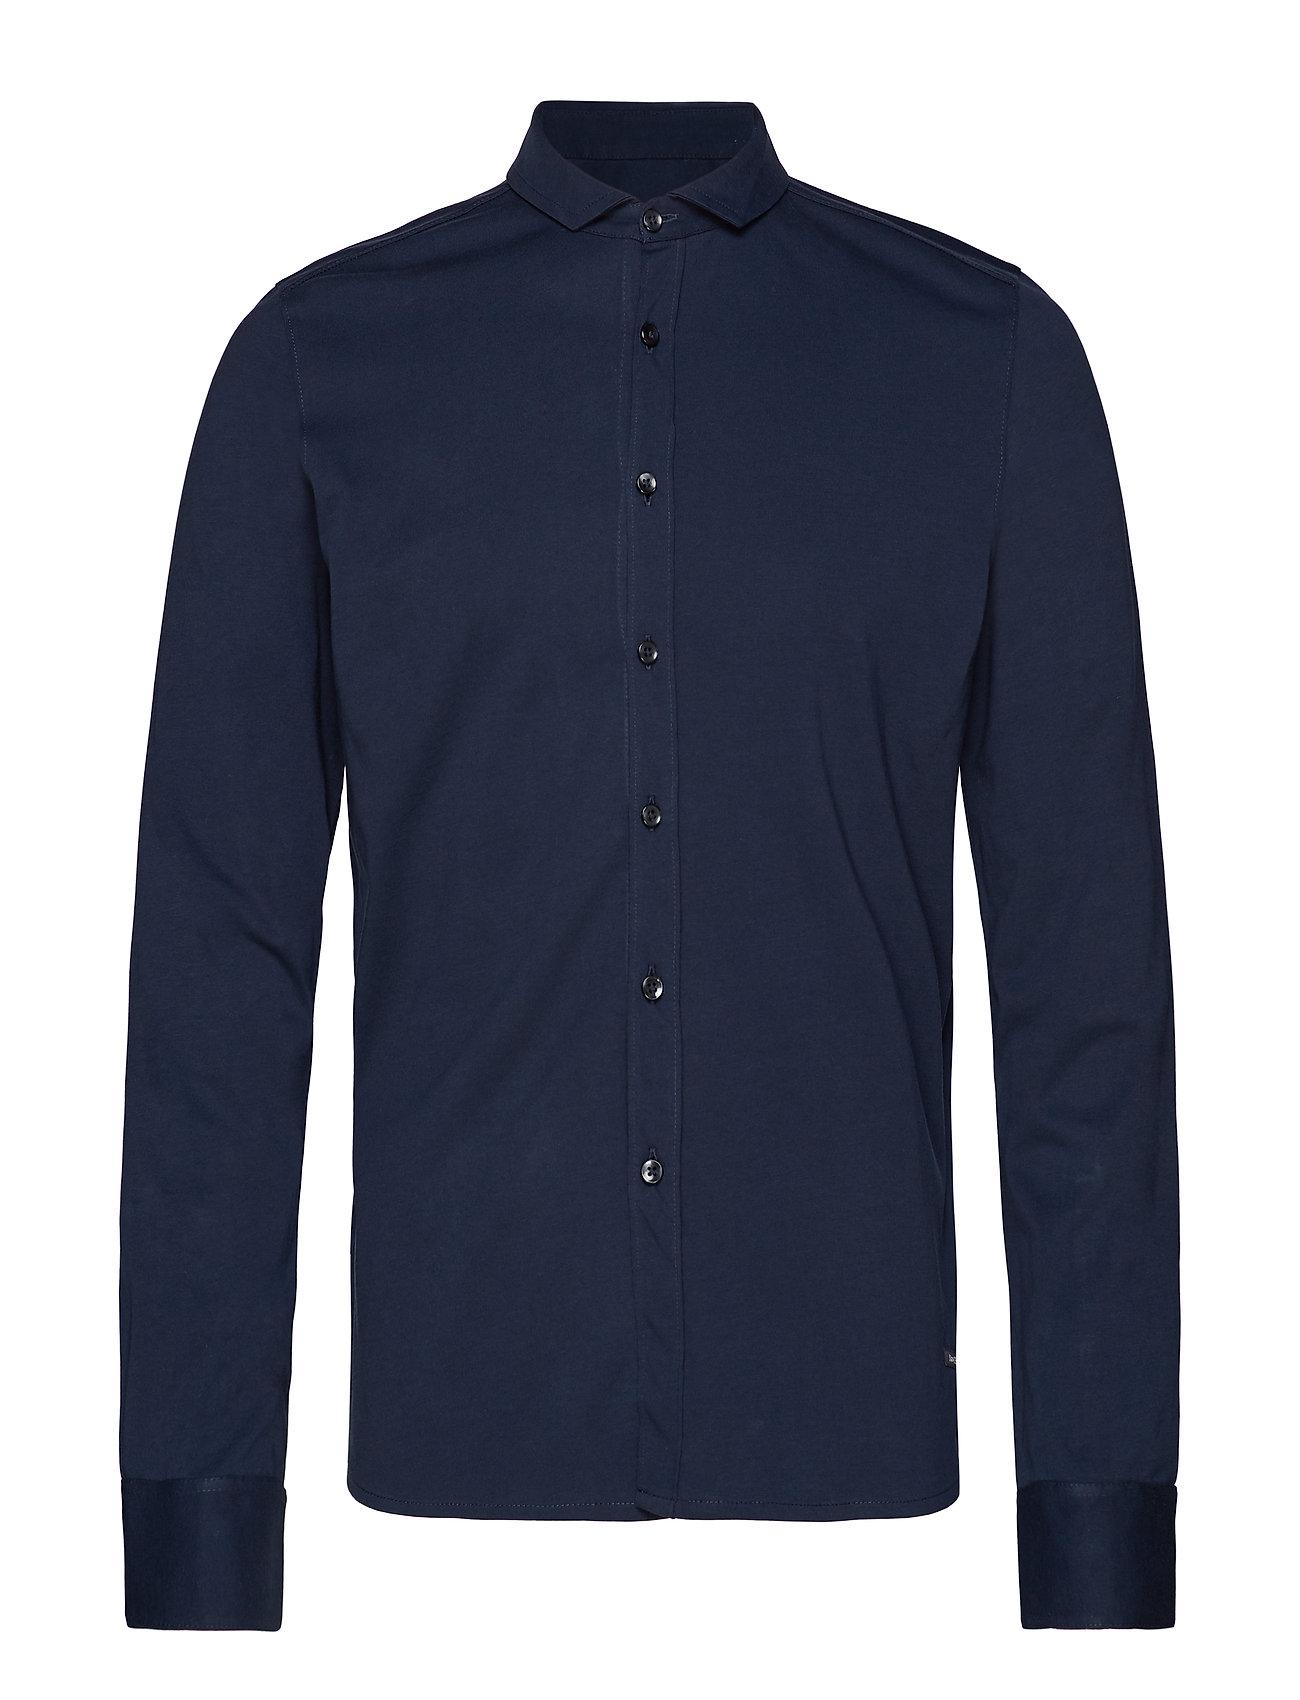 Marc O'Polo Shirt - TOTAL ECLIPSE